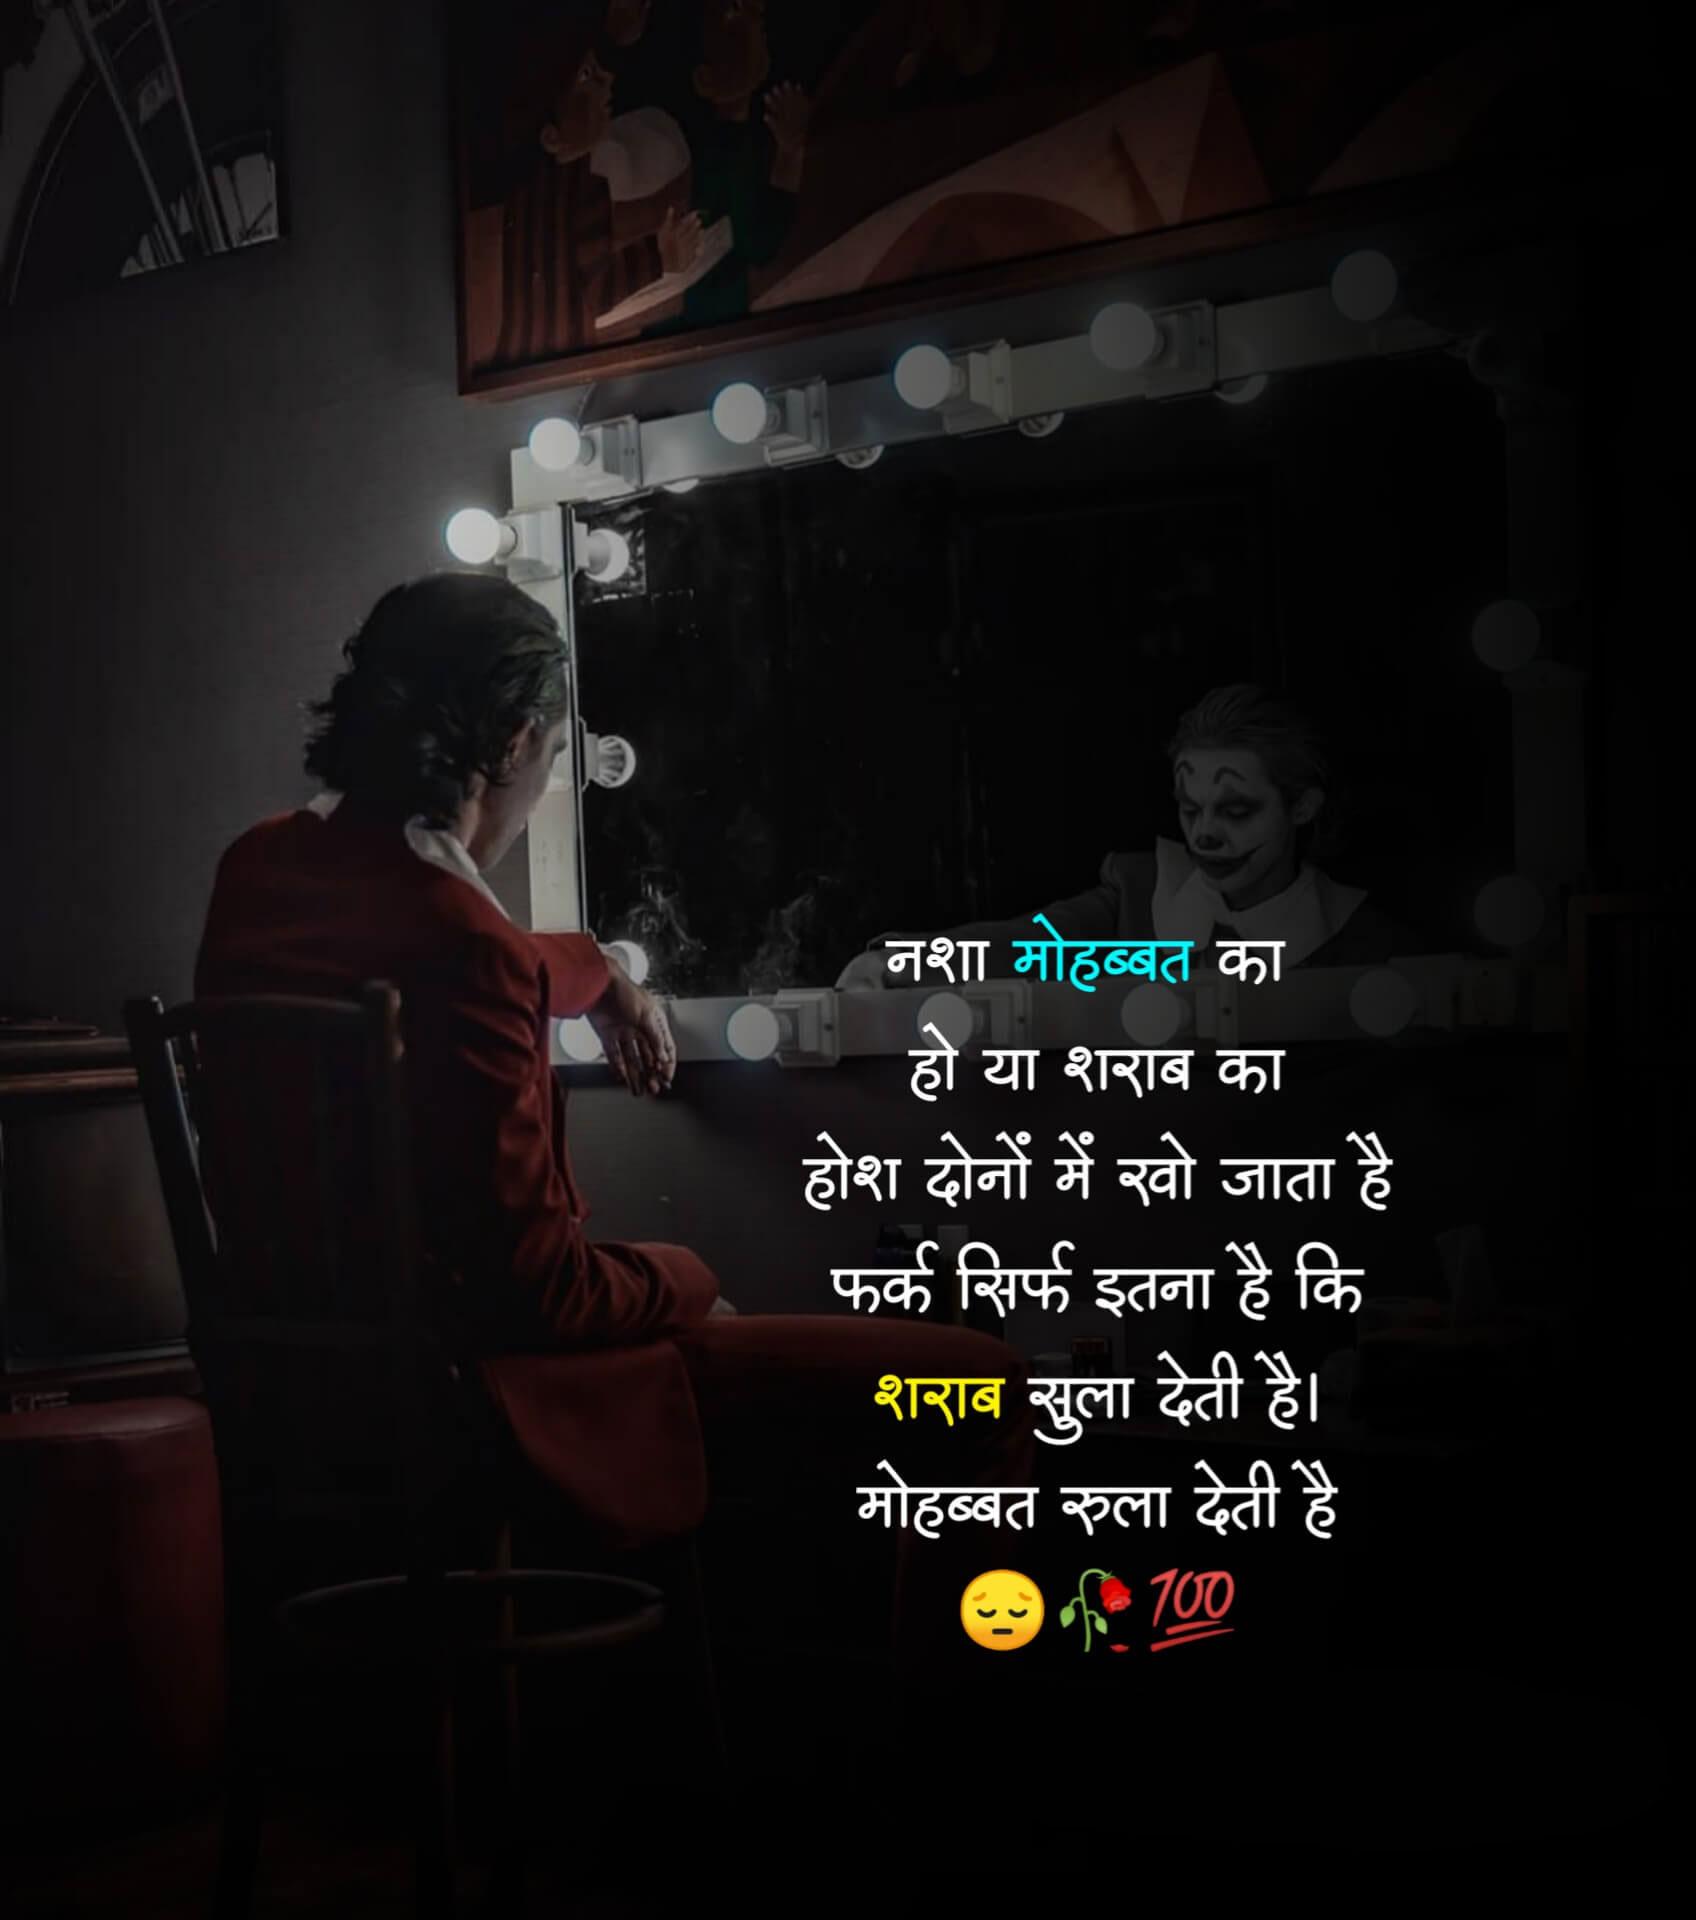 Latest Sad Boy Shayari Images for dp